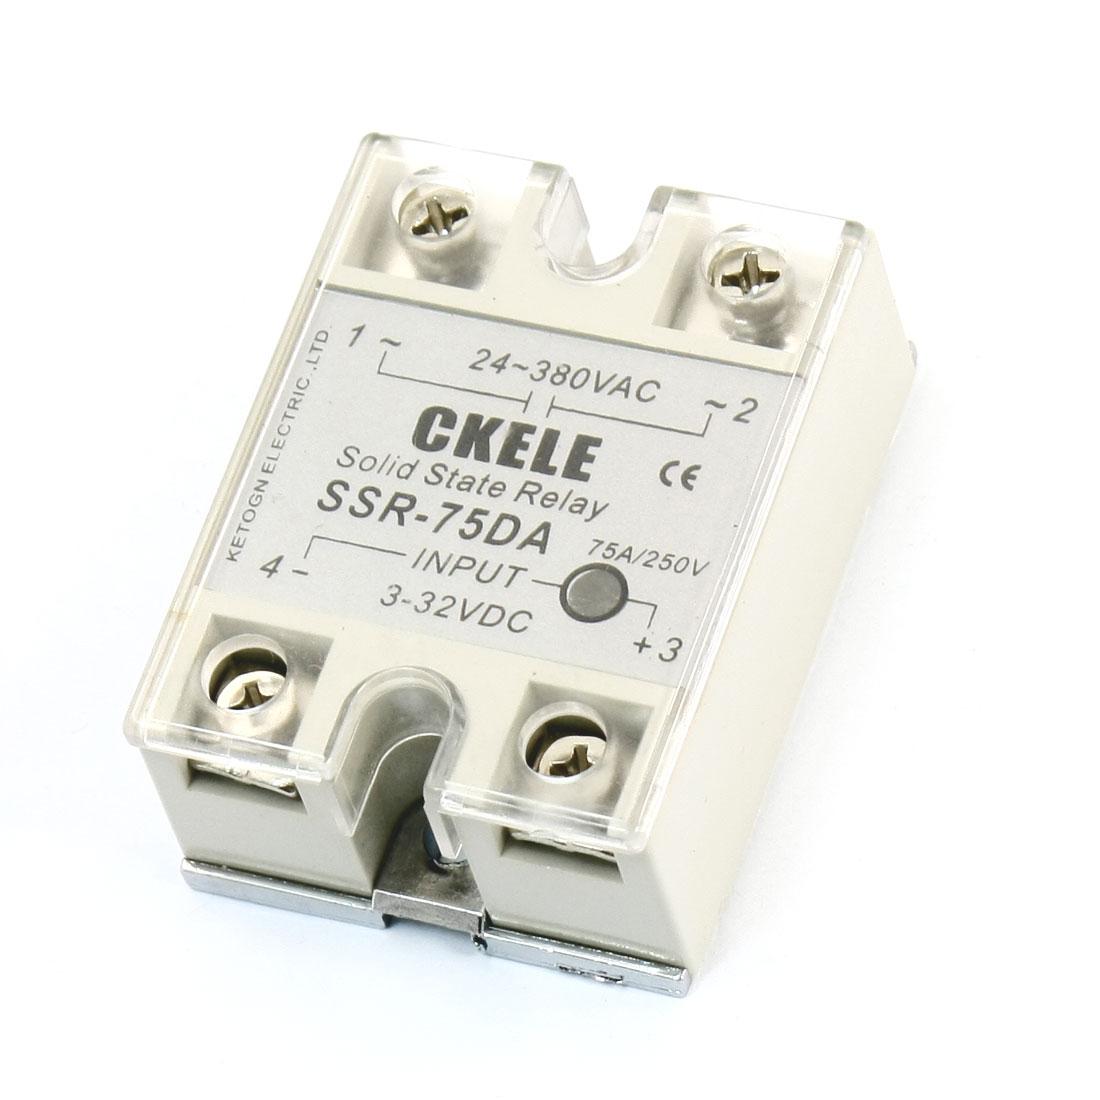 AC 24-380V Temperature Contoller DC-AC Solid State Relay SSR-75DA